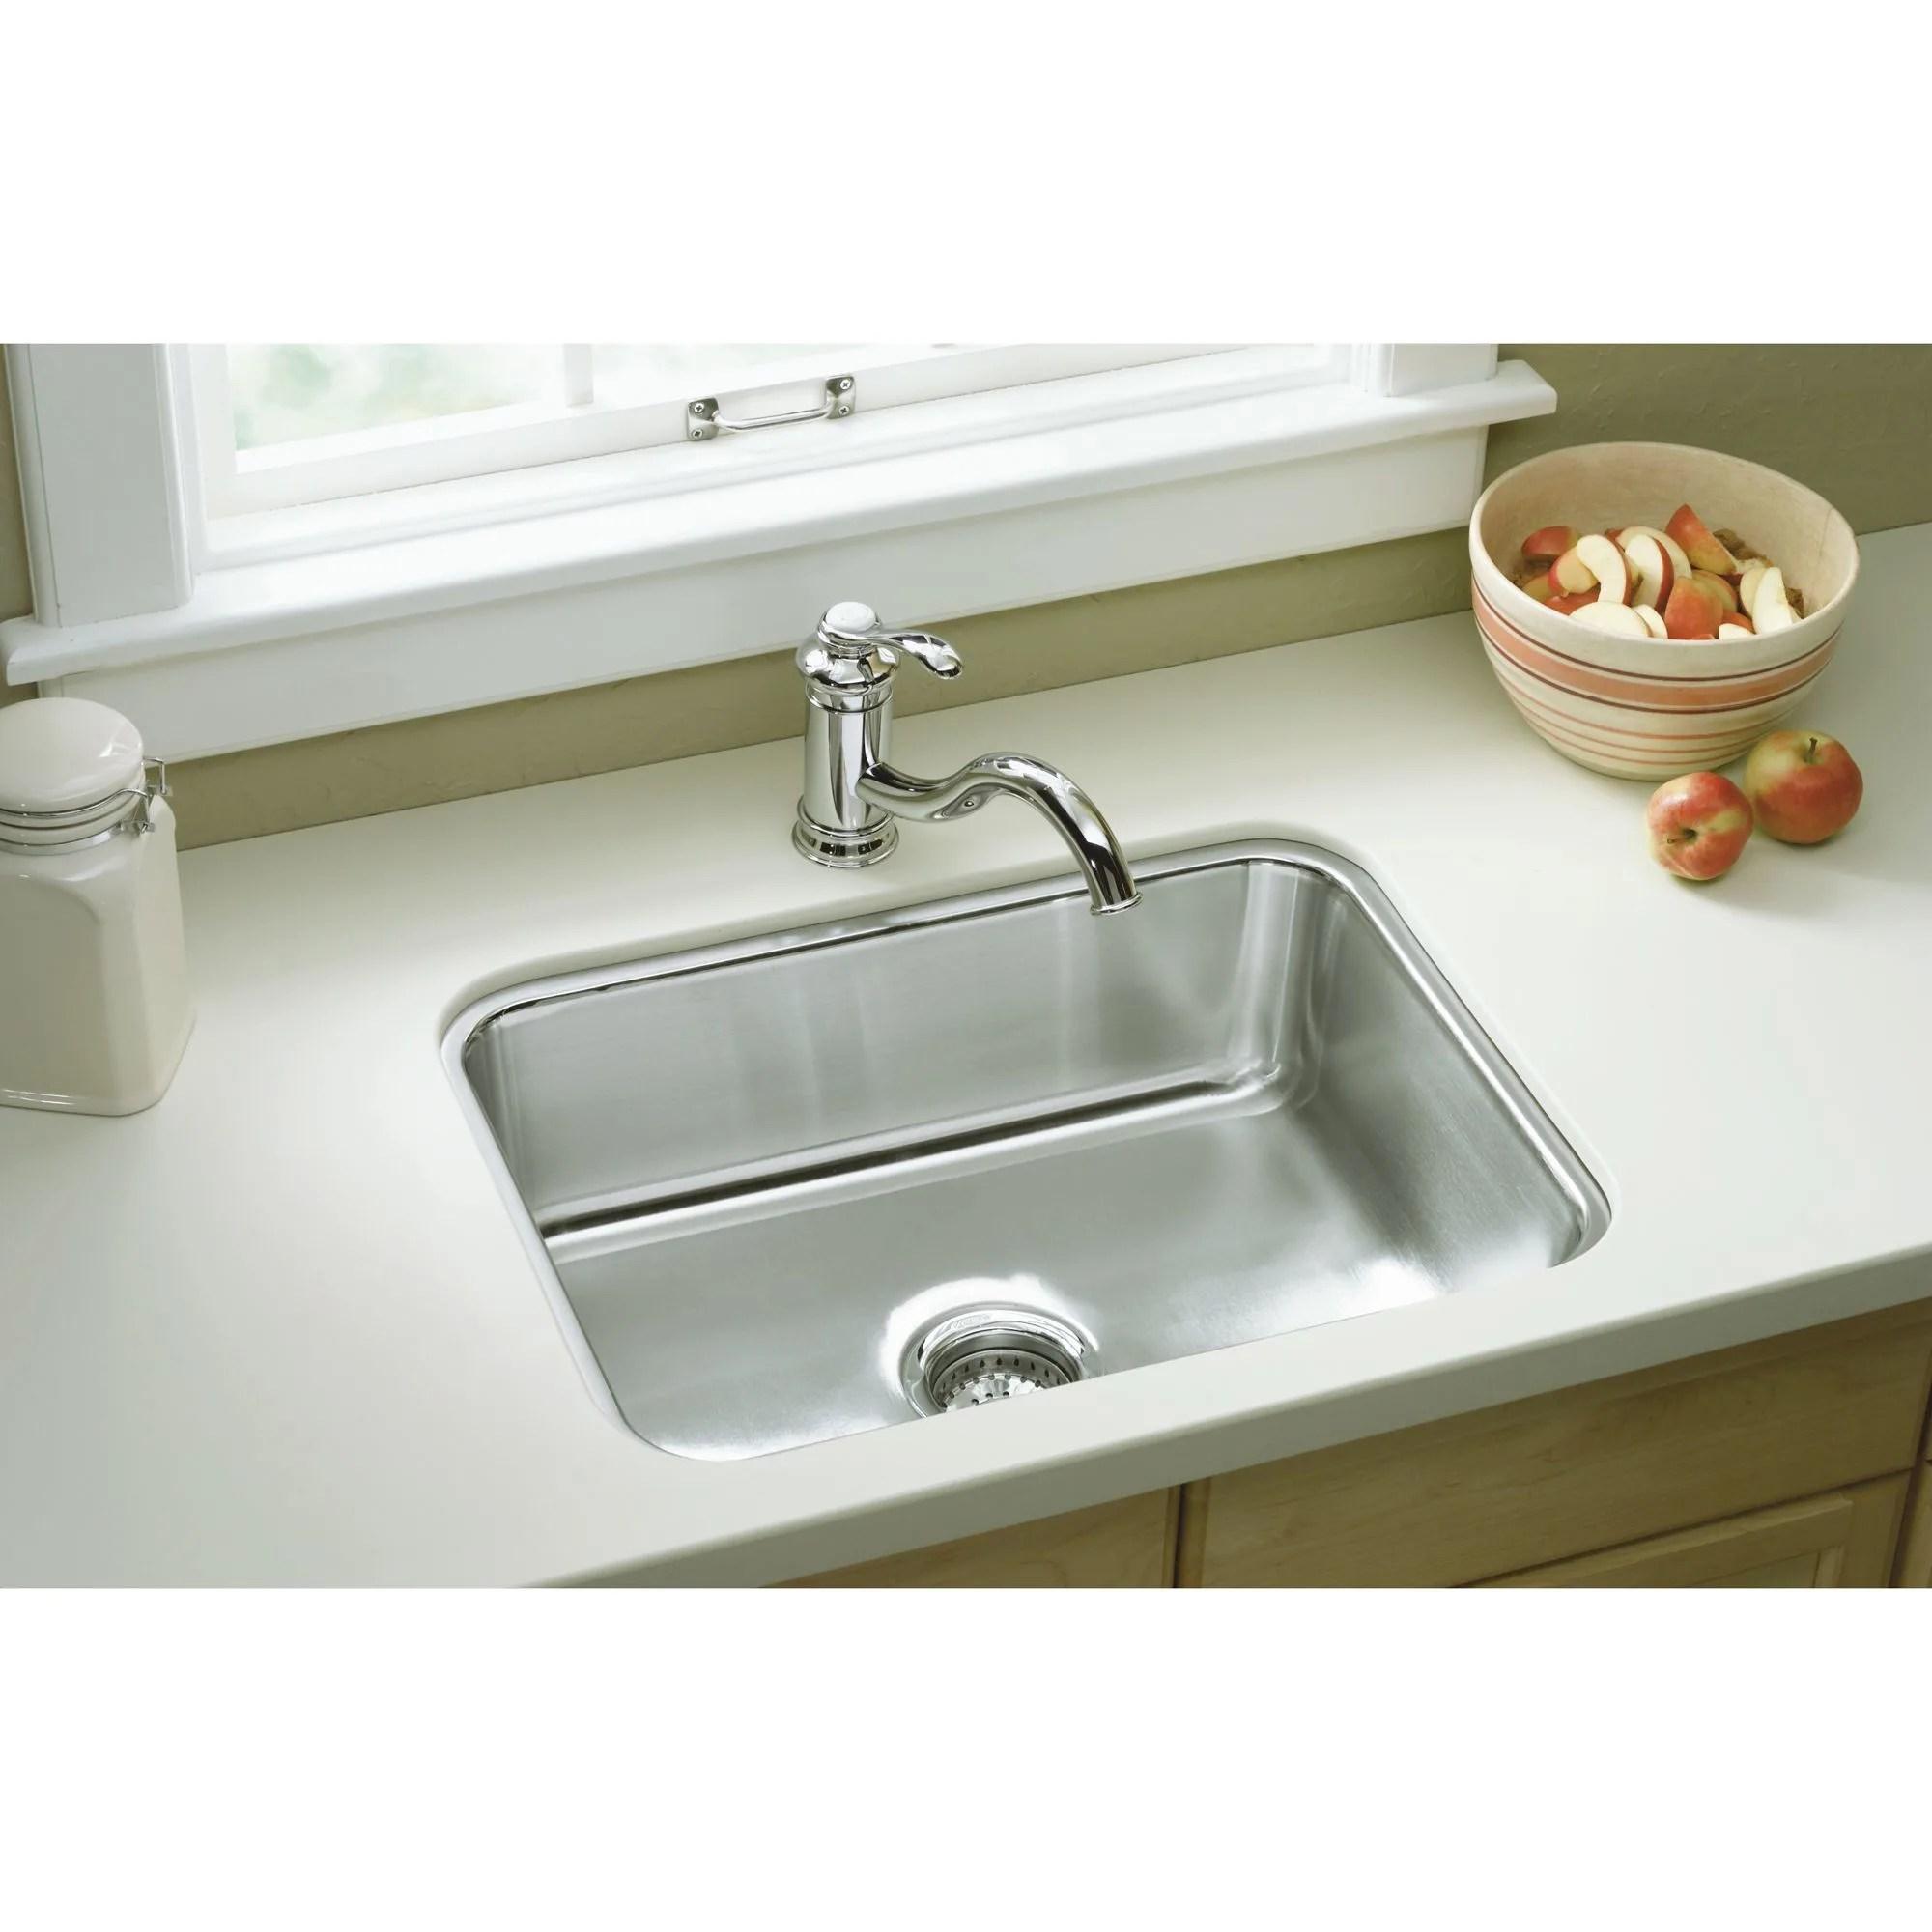 24 kitchen sink delta faucet parts sterling 11447 na stainless steel mcallister single basin undermount with silentshield reg com